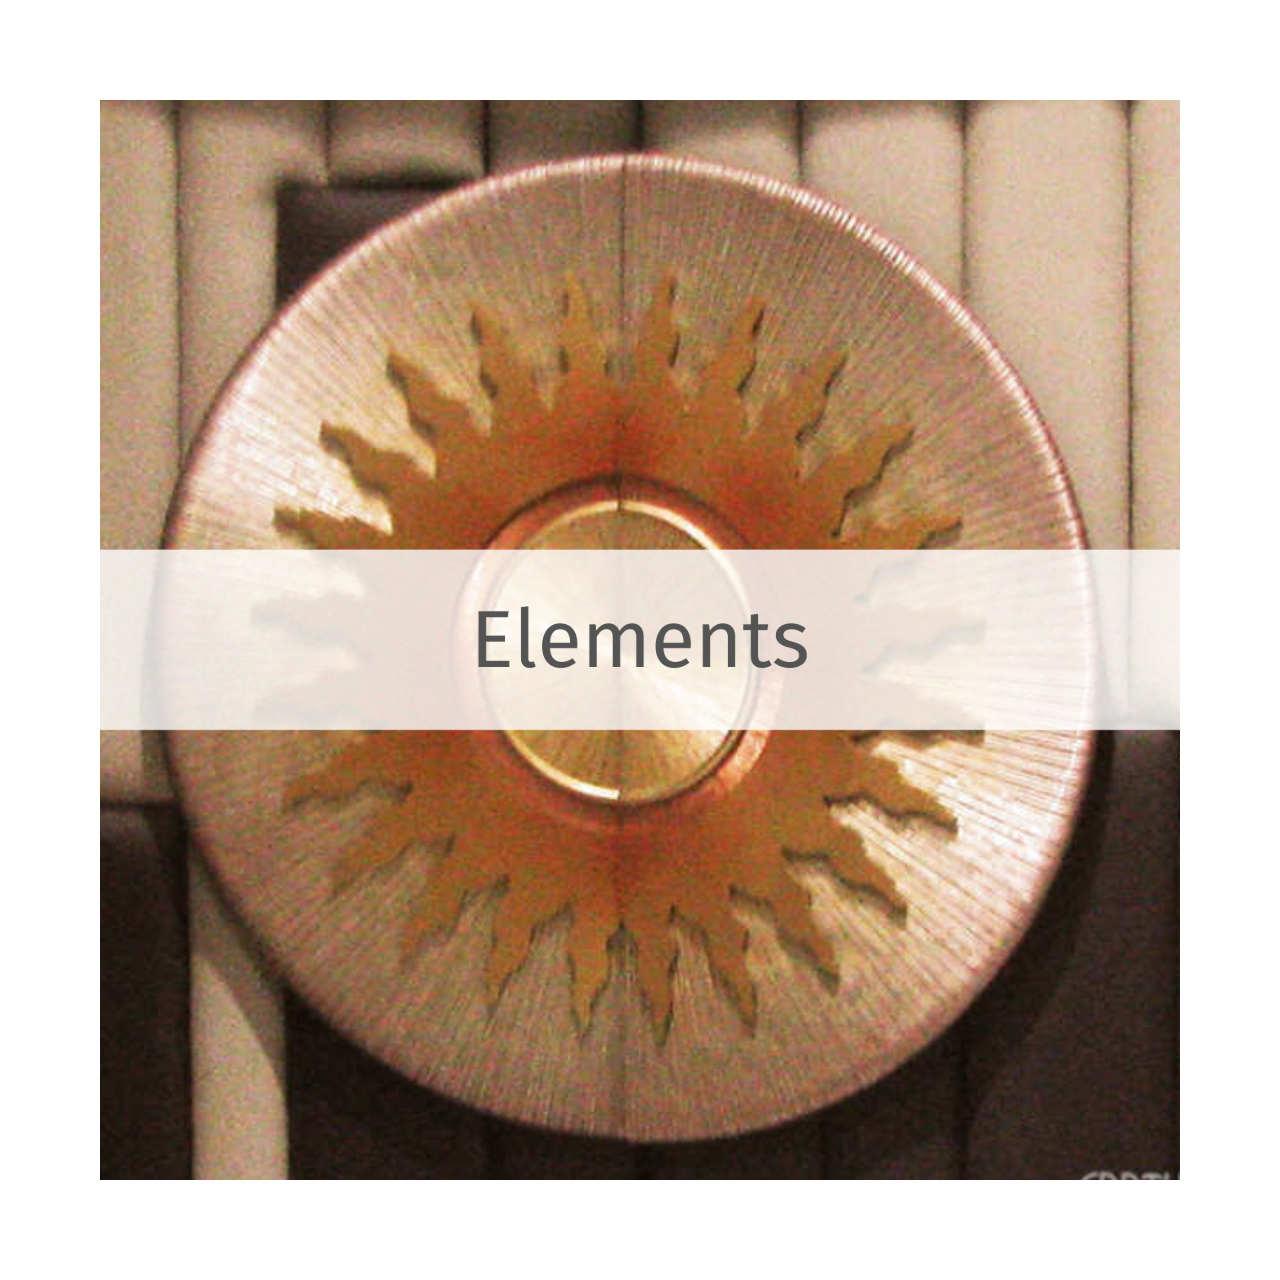 Elements12.jpg